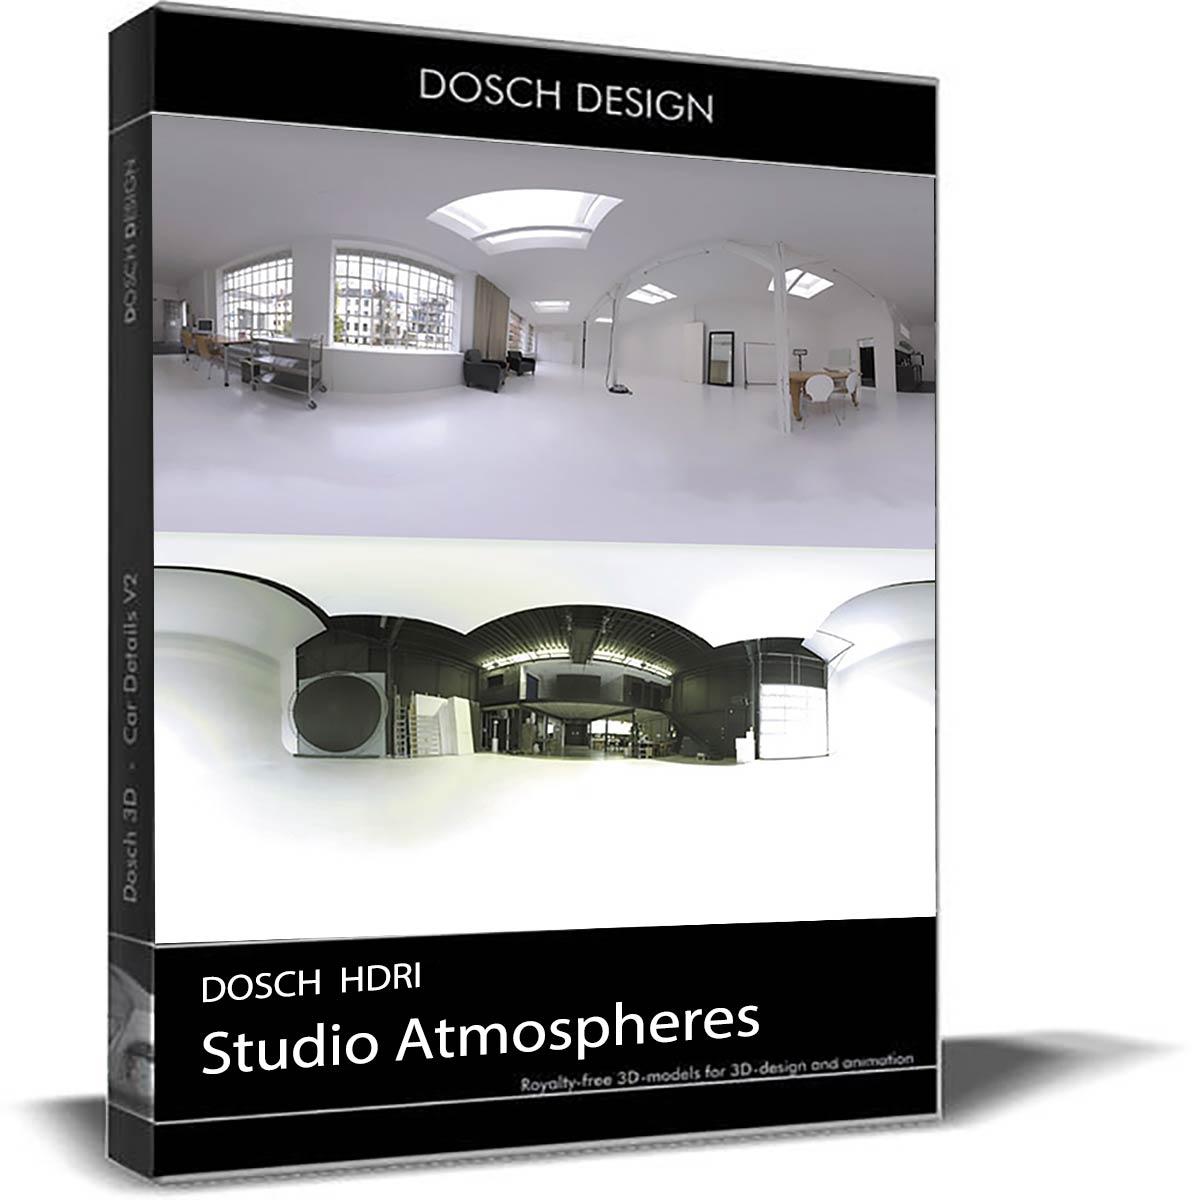 Download DOSCH HDRI: Studio Atmospheres